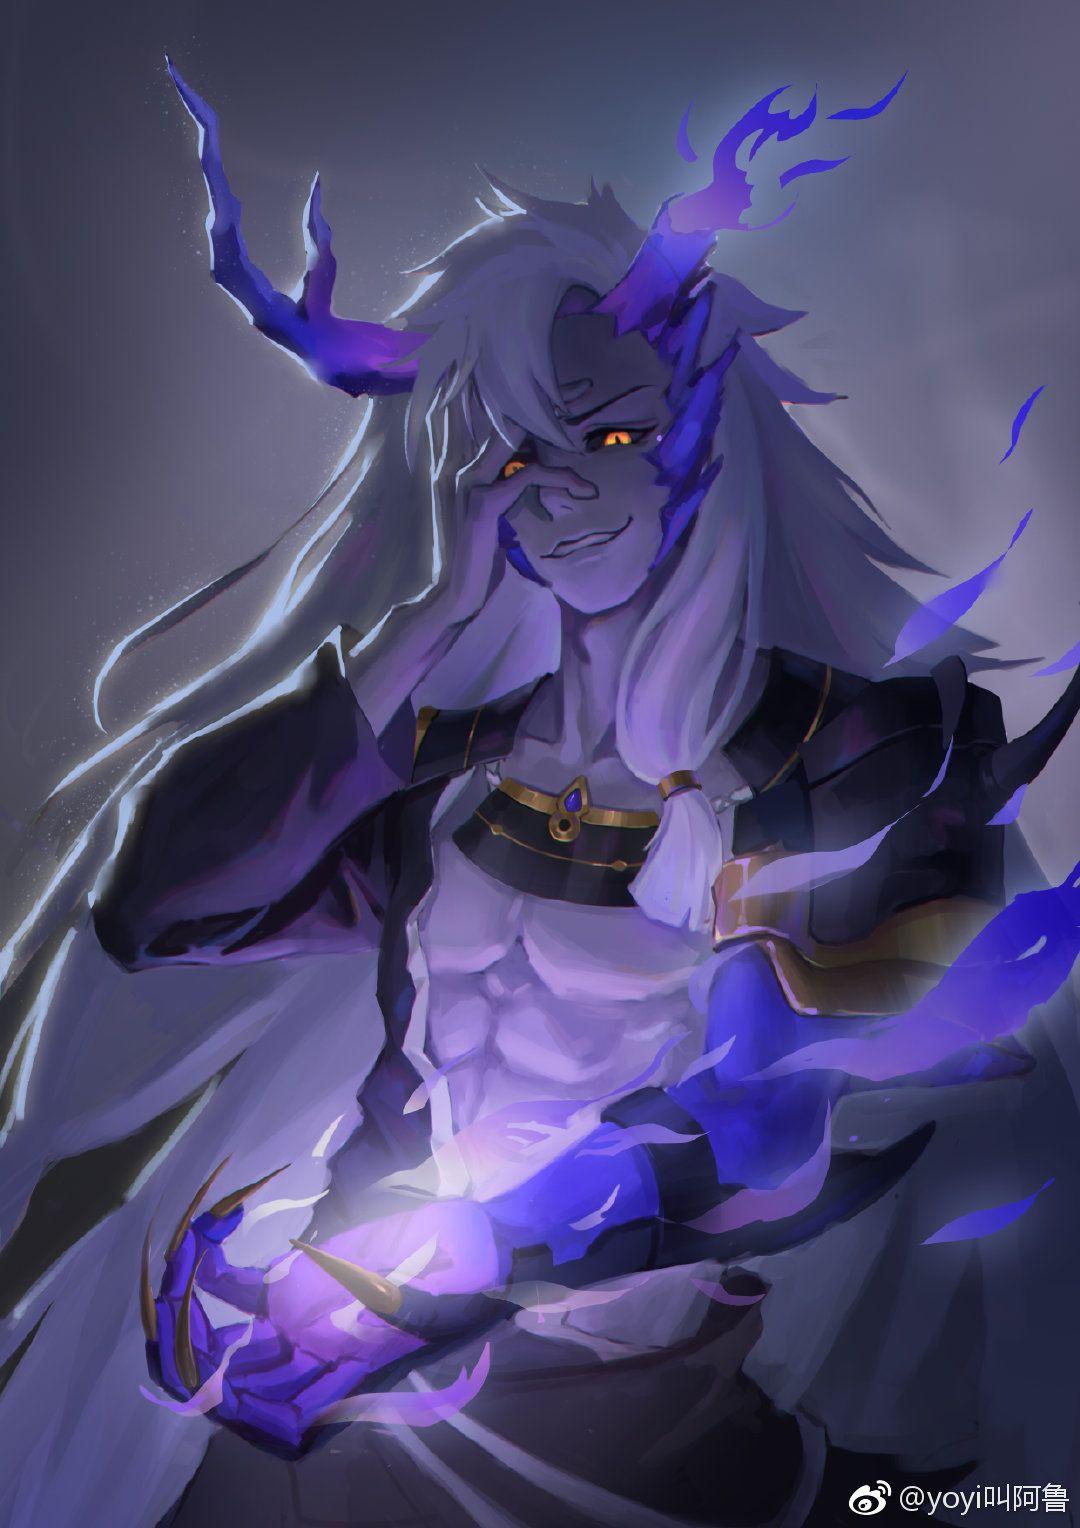 Demon girl manga